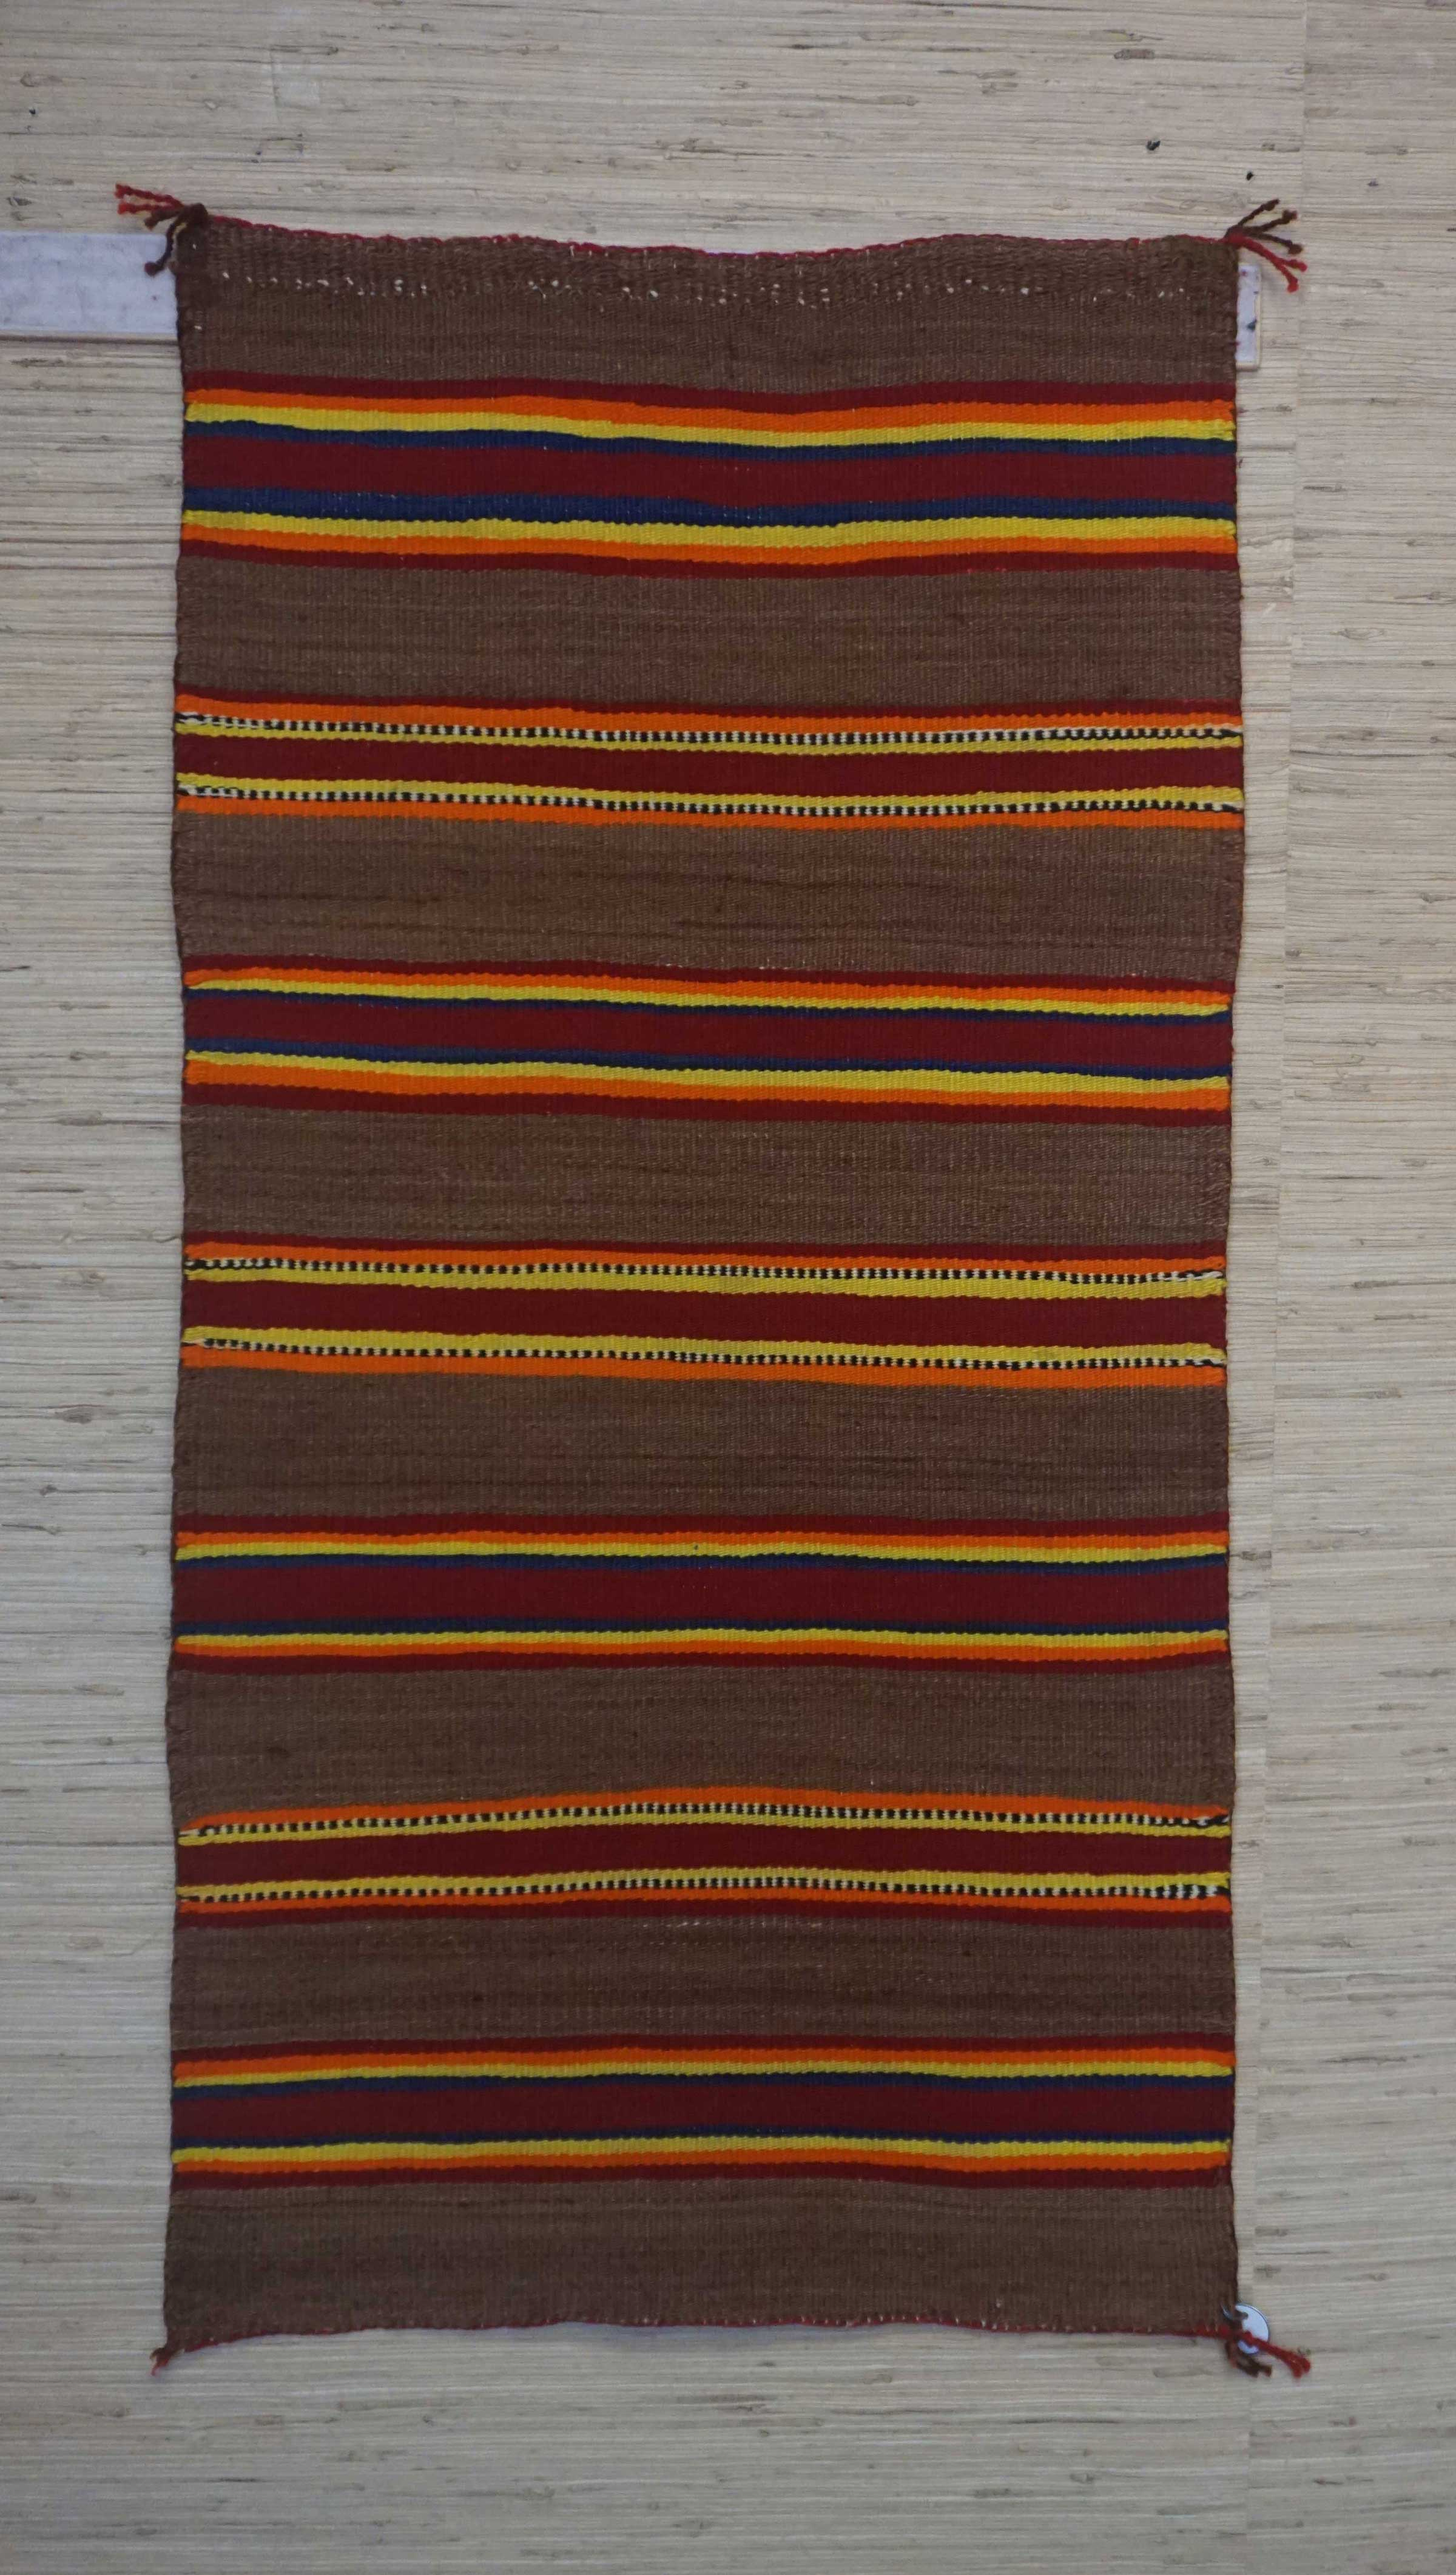 Youth Navajo Double Saddle Blanket 974 Charley S Navajo